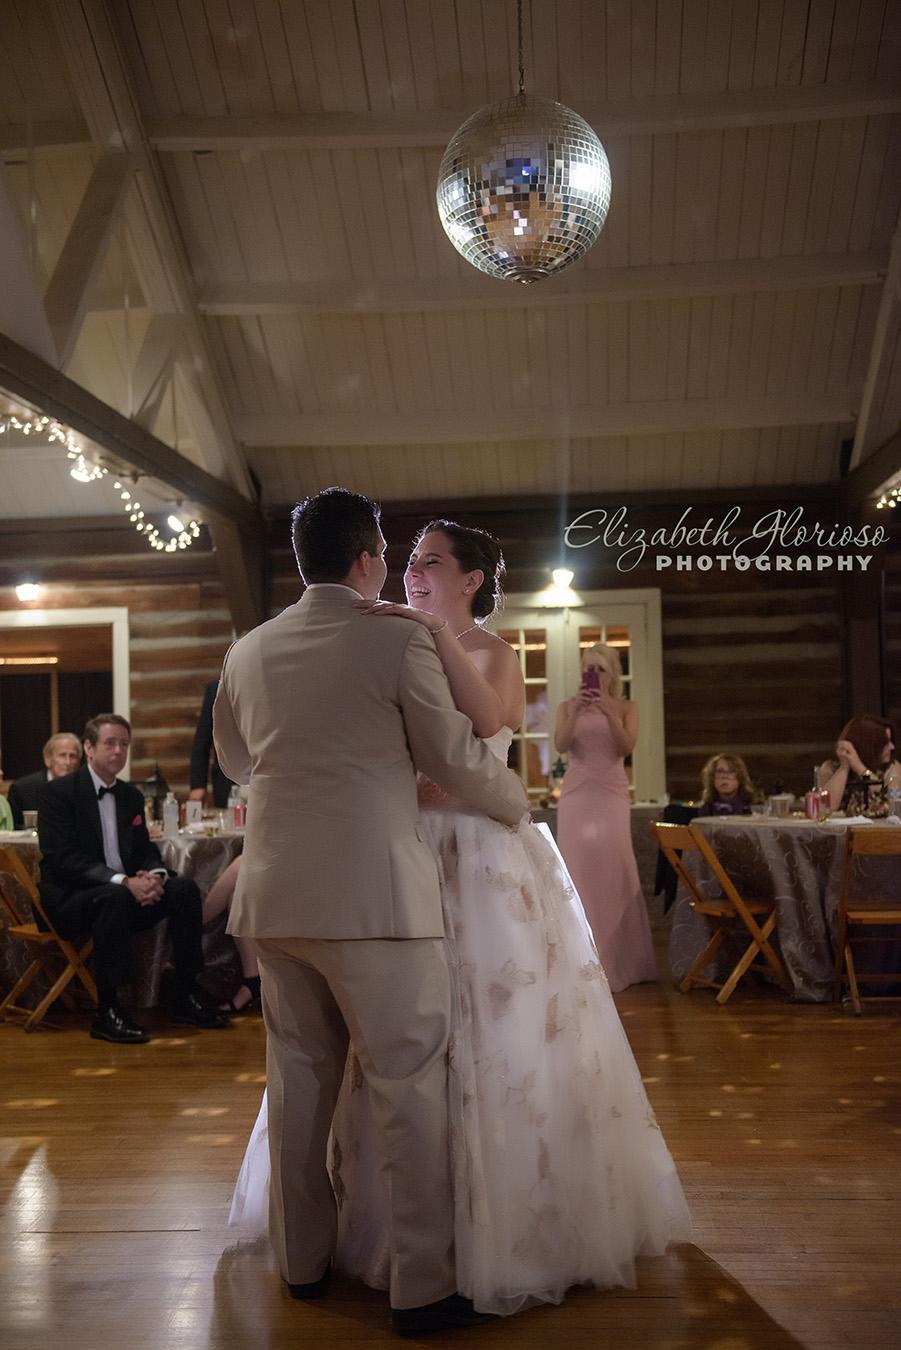 Vermilion_wedding_Glorioso Photography_1044